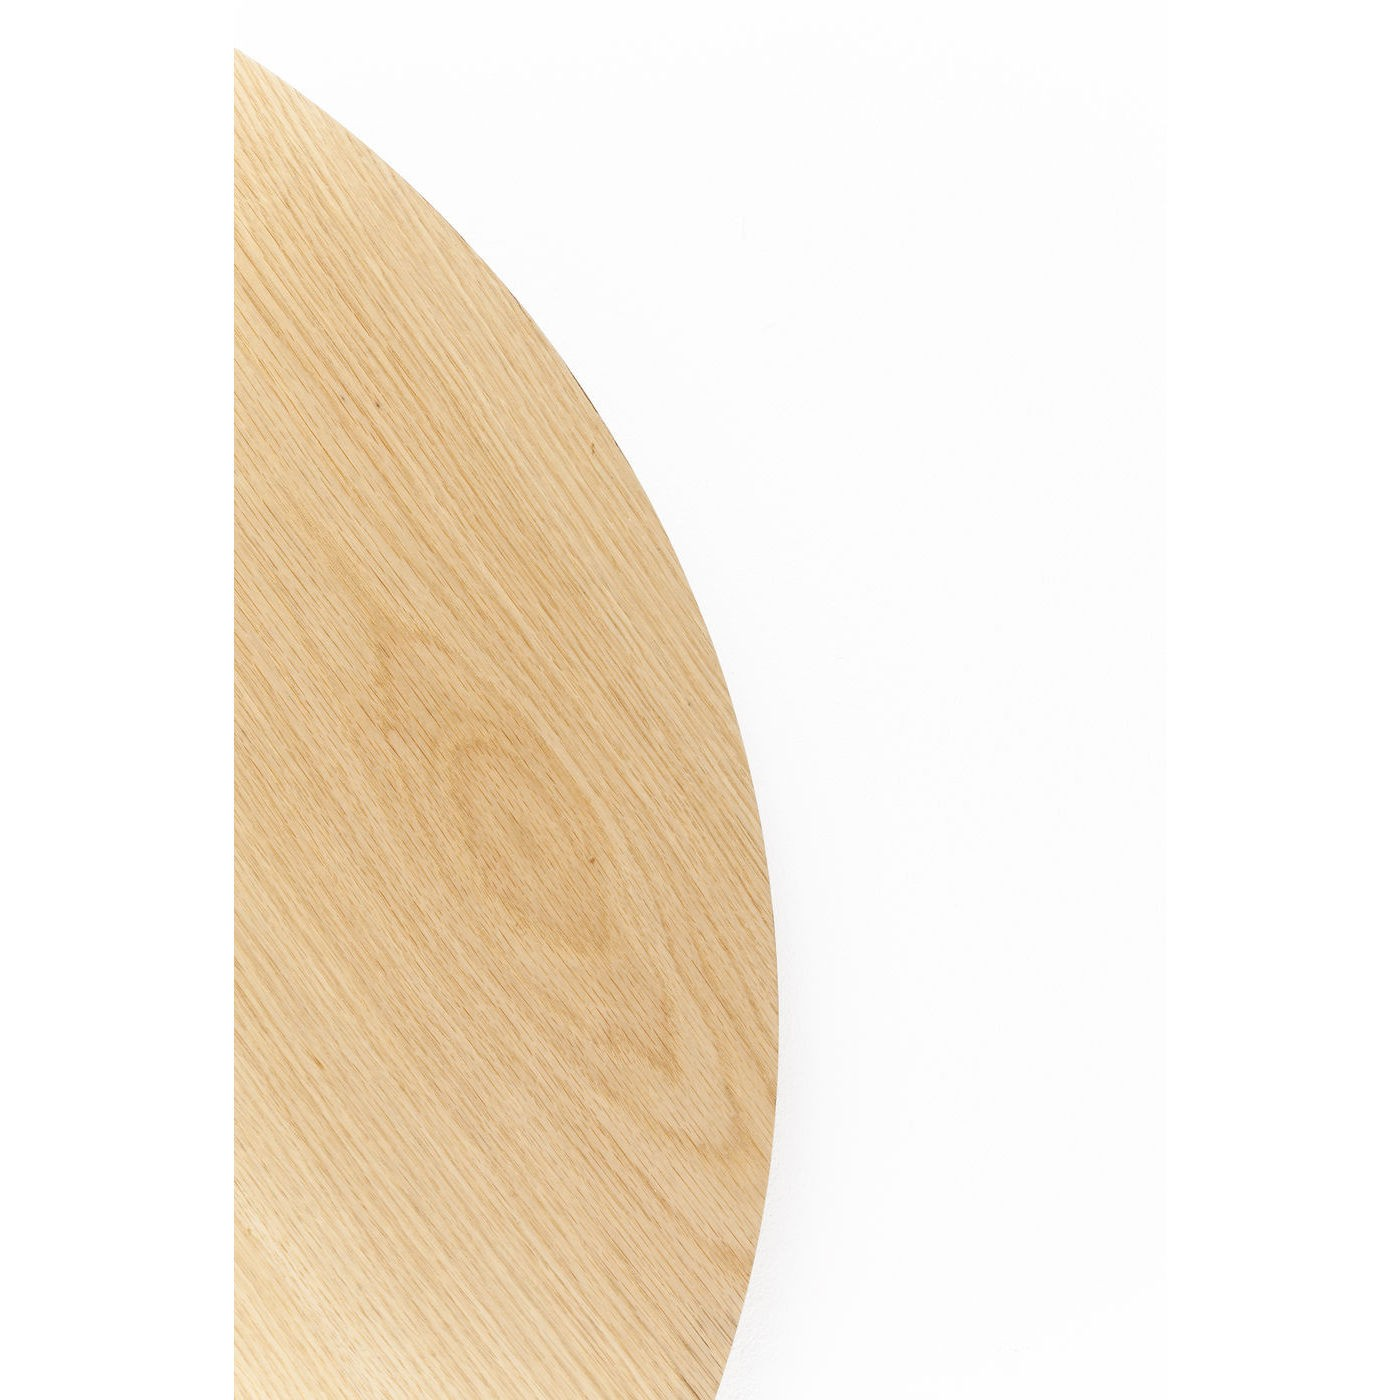 Plateau de table Invitation rond chêne Kare Design Diamètre - 90cm